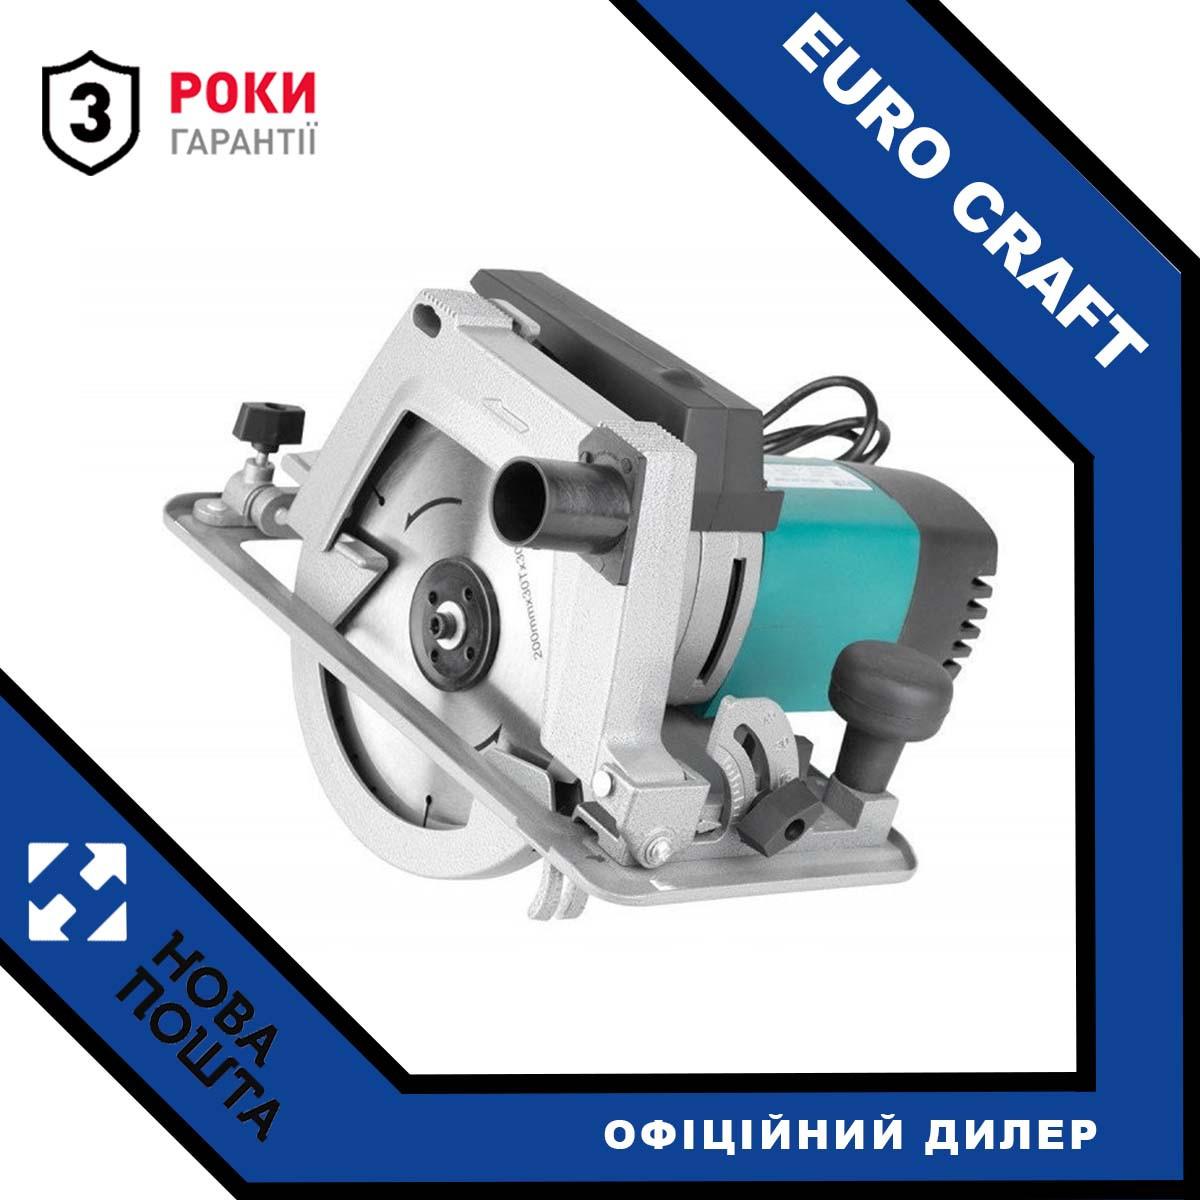 Пила дискова EURO CRAFT CS221